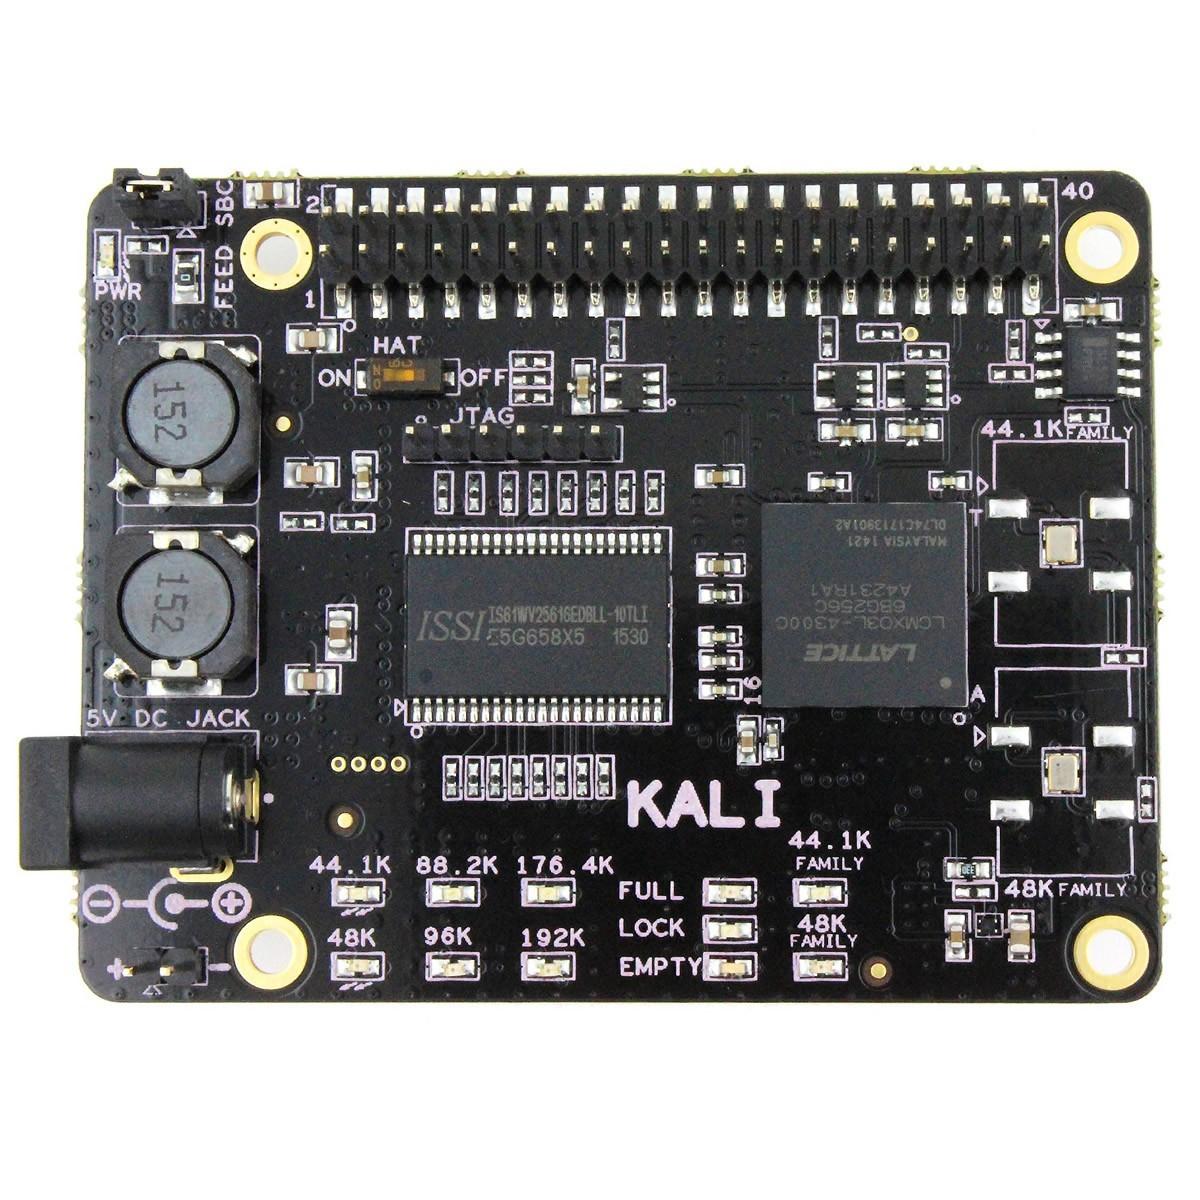 ALLO KALI Reclocker I2S FIFO Sparky SBC and Raspberry Pi 22/24MHz 192kHZ